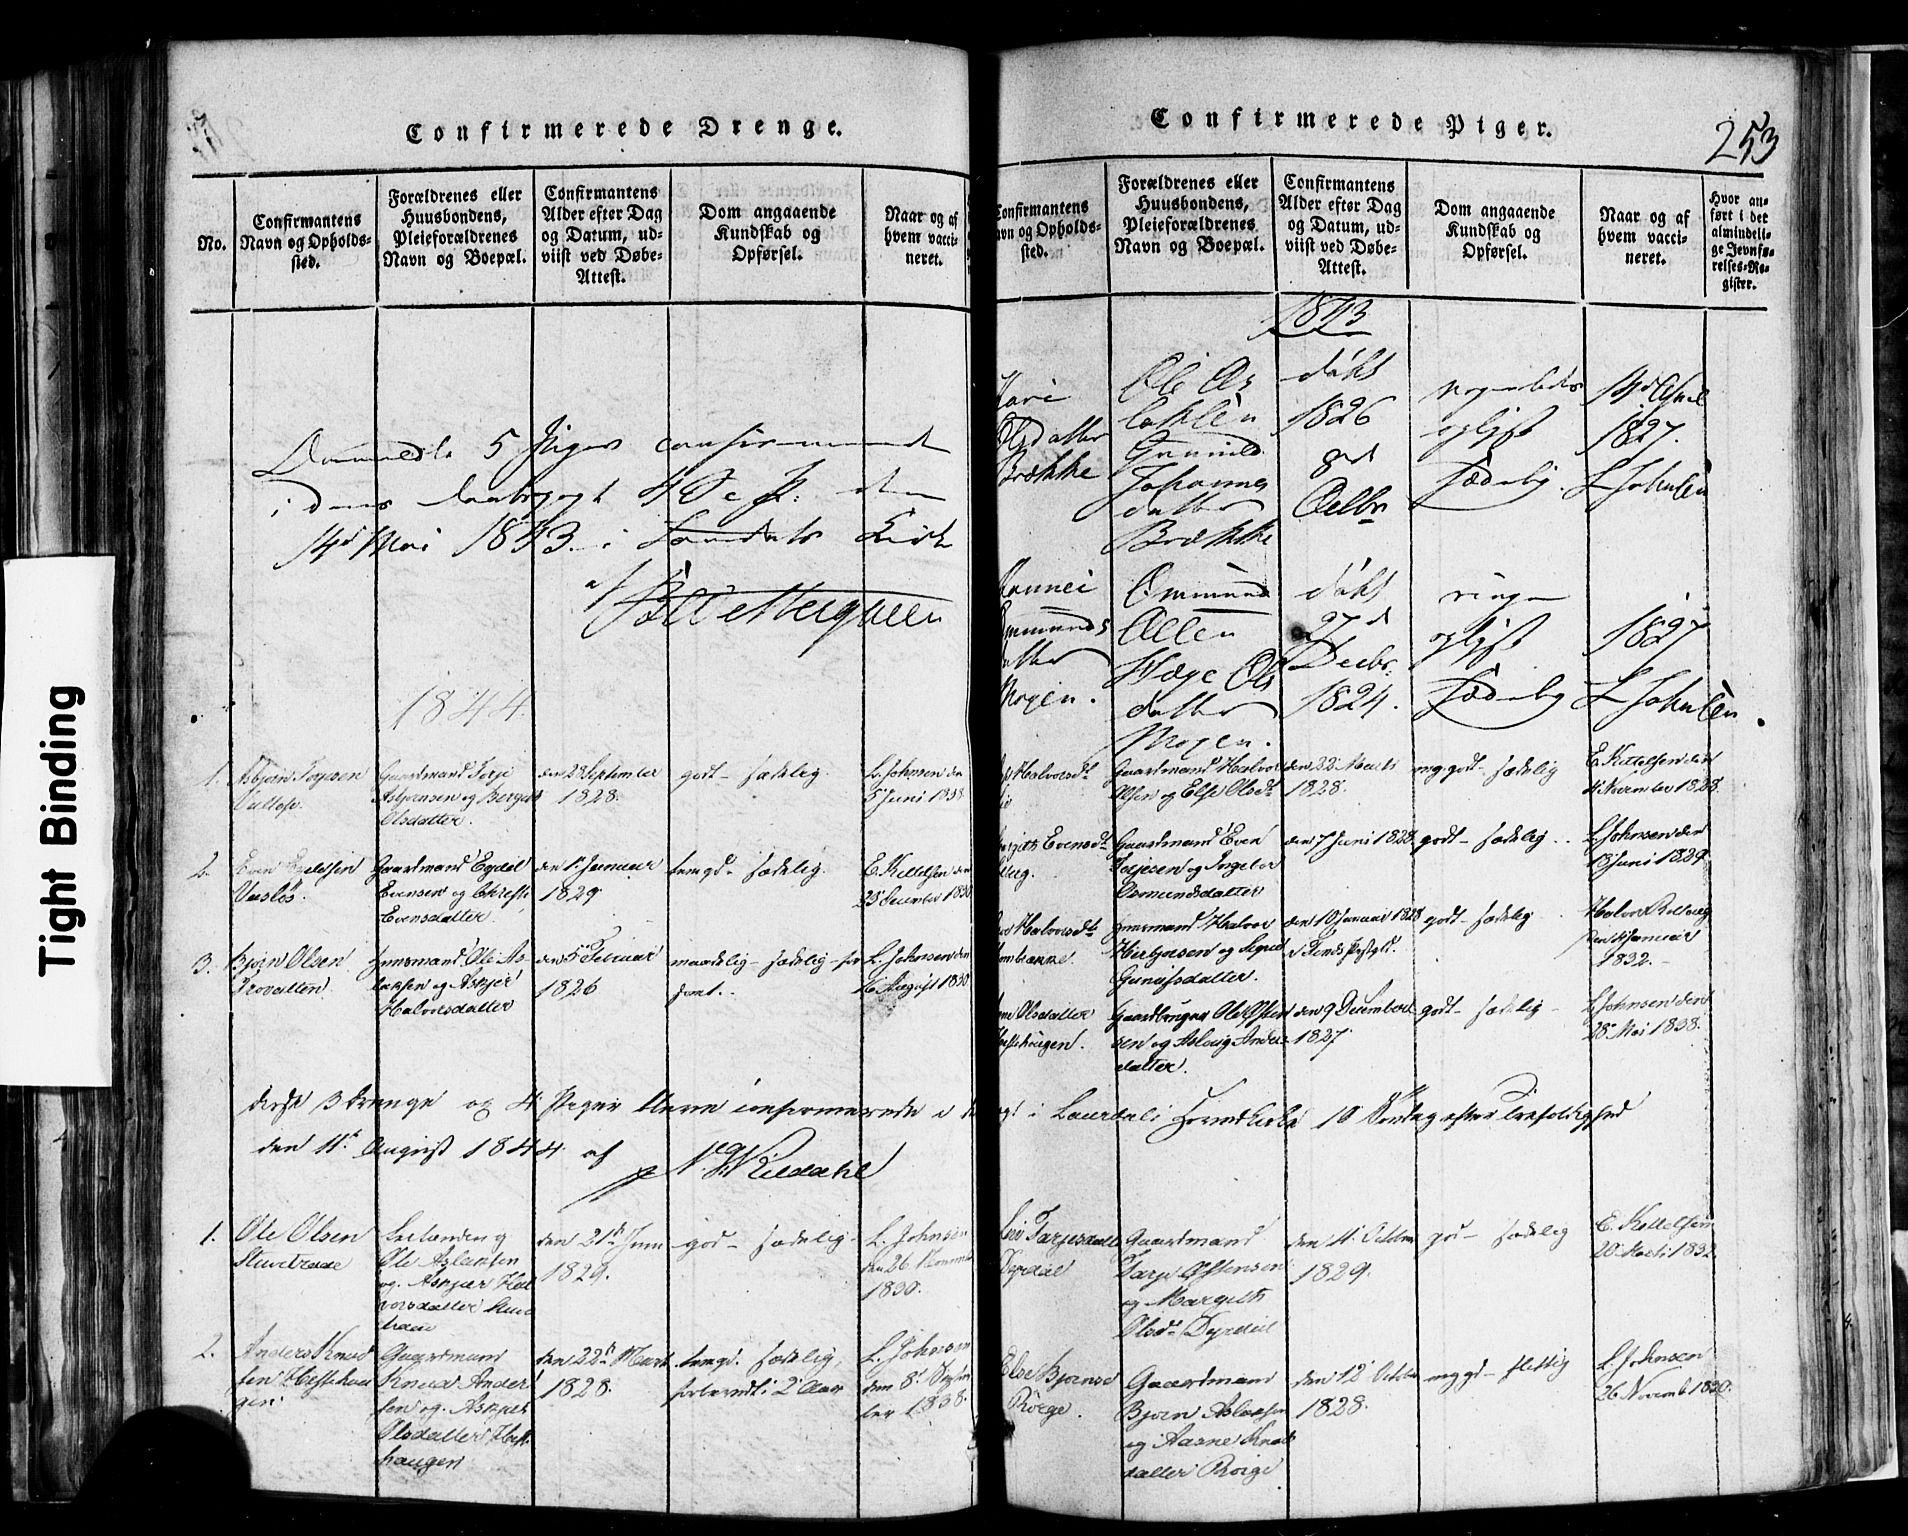 SAKO, Rauland kirkebøker, F/Fa/L0002: Ministerialbok nr. 2, 1815-1860, s. 253